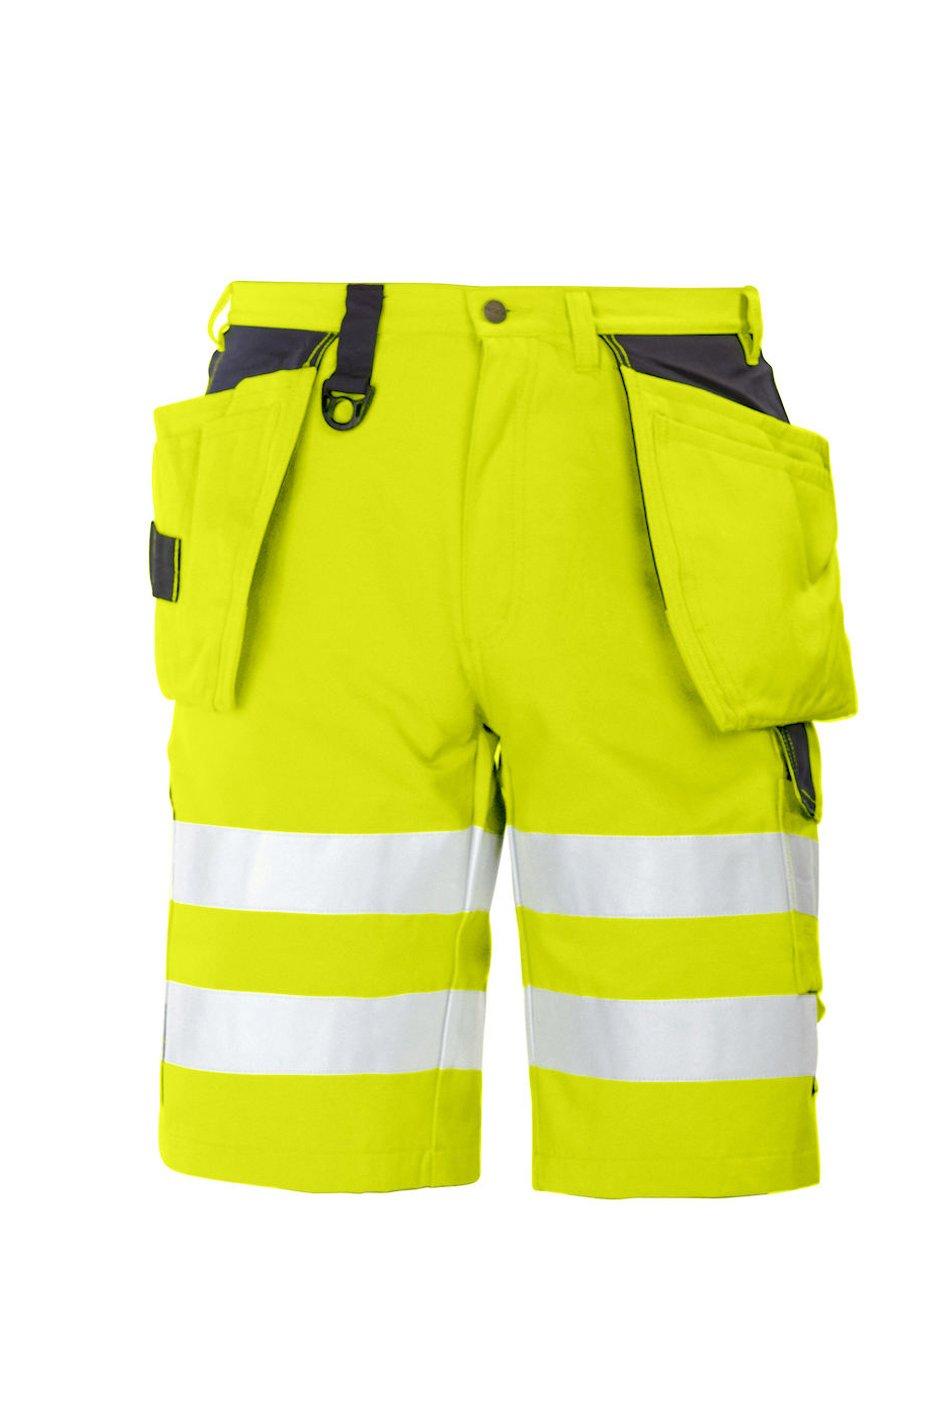 Shorts EN ISO 20471 Klasse 2, orange/grau